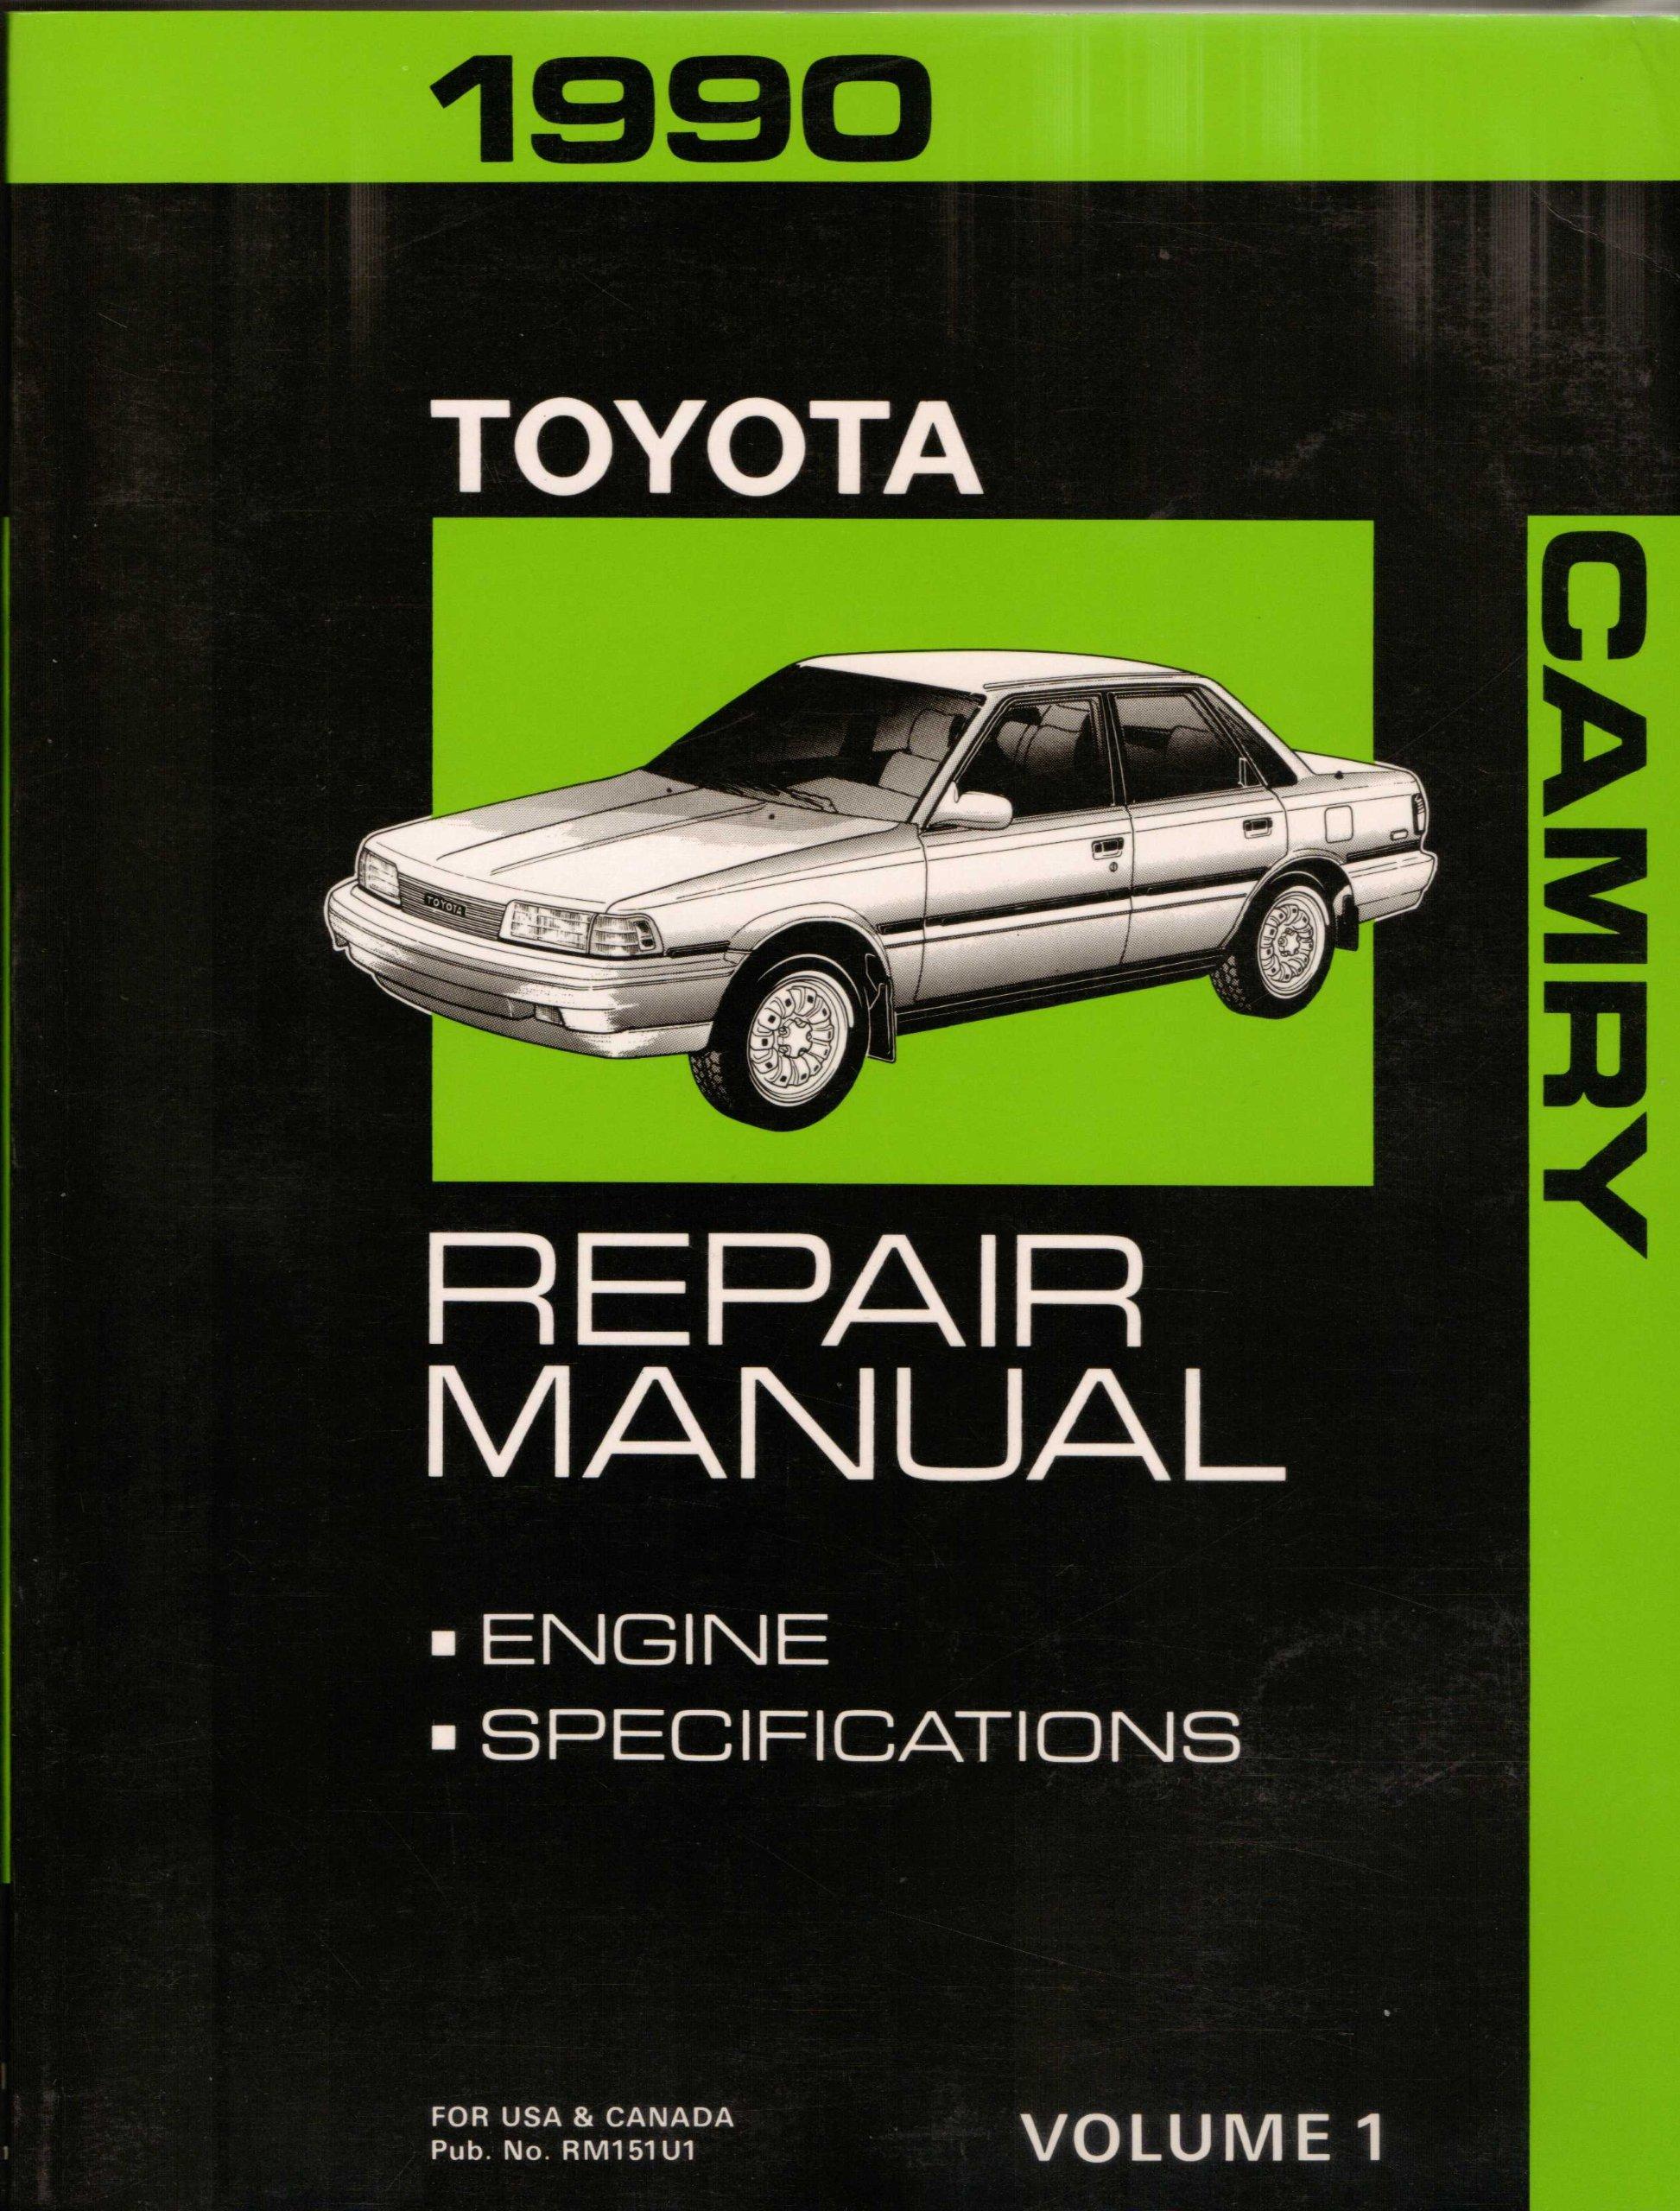 1990 Toyota Camry Repair Manual: Engine, Specifications (Volume 1): Toyota:  Amazon.com: Books